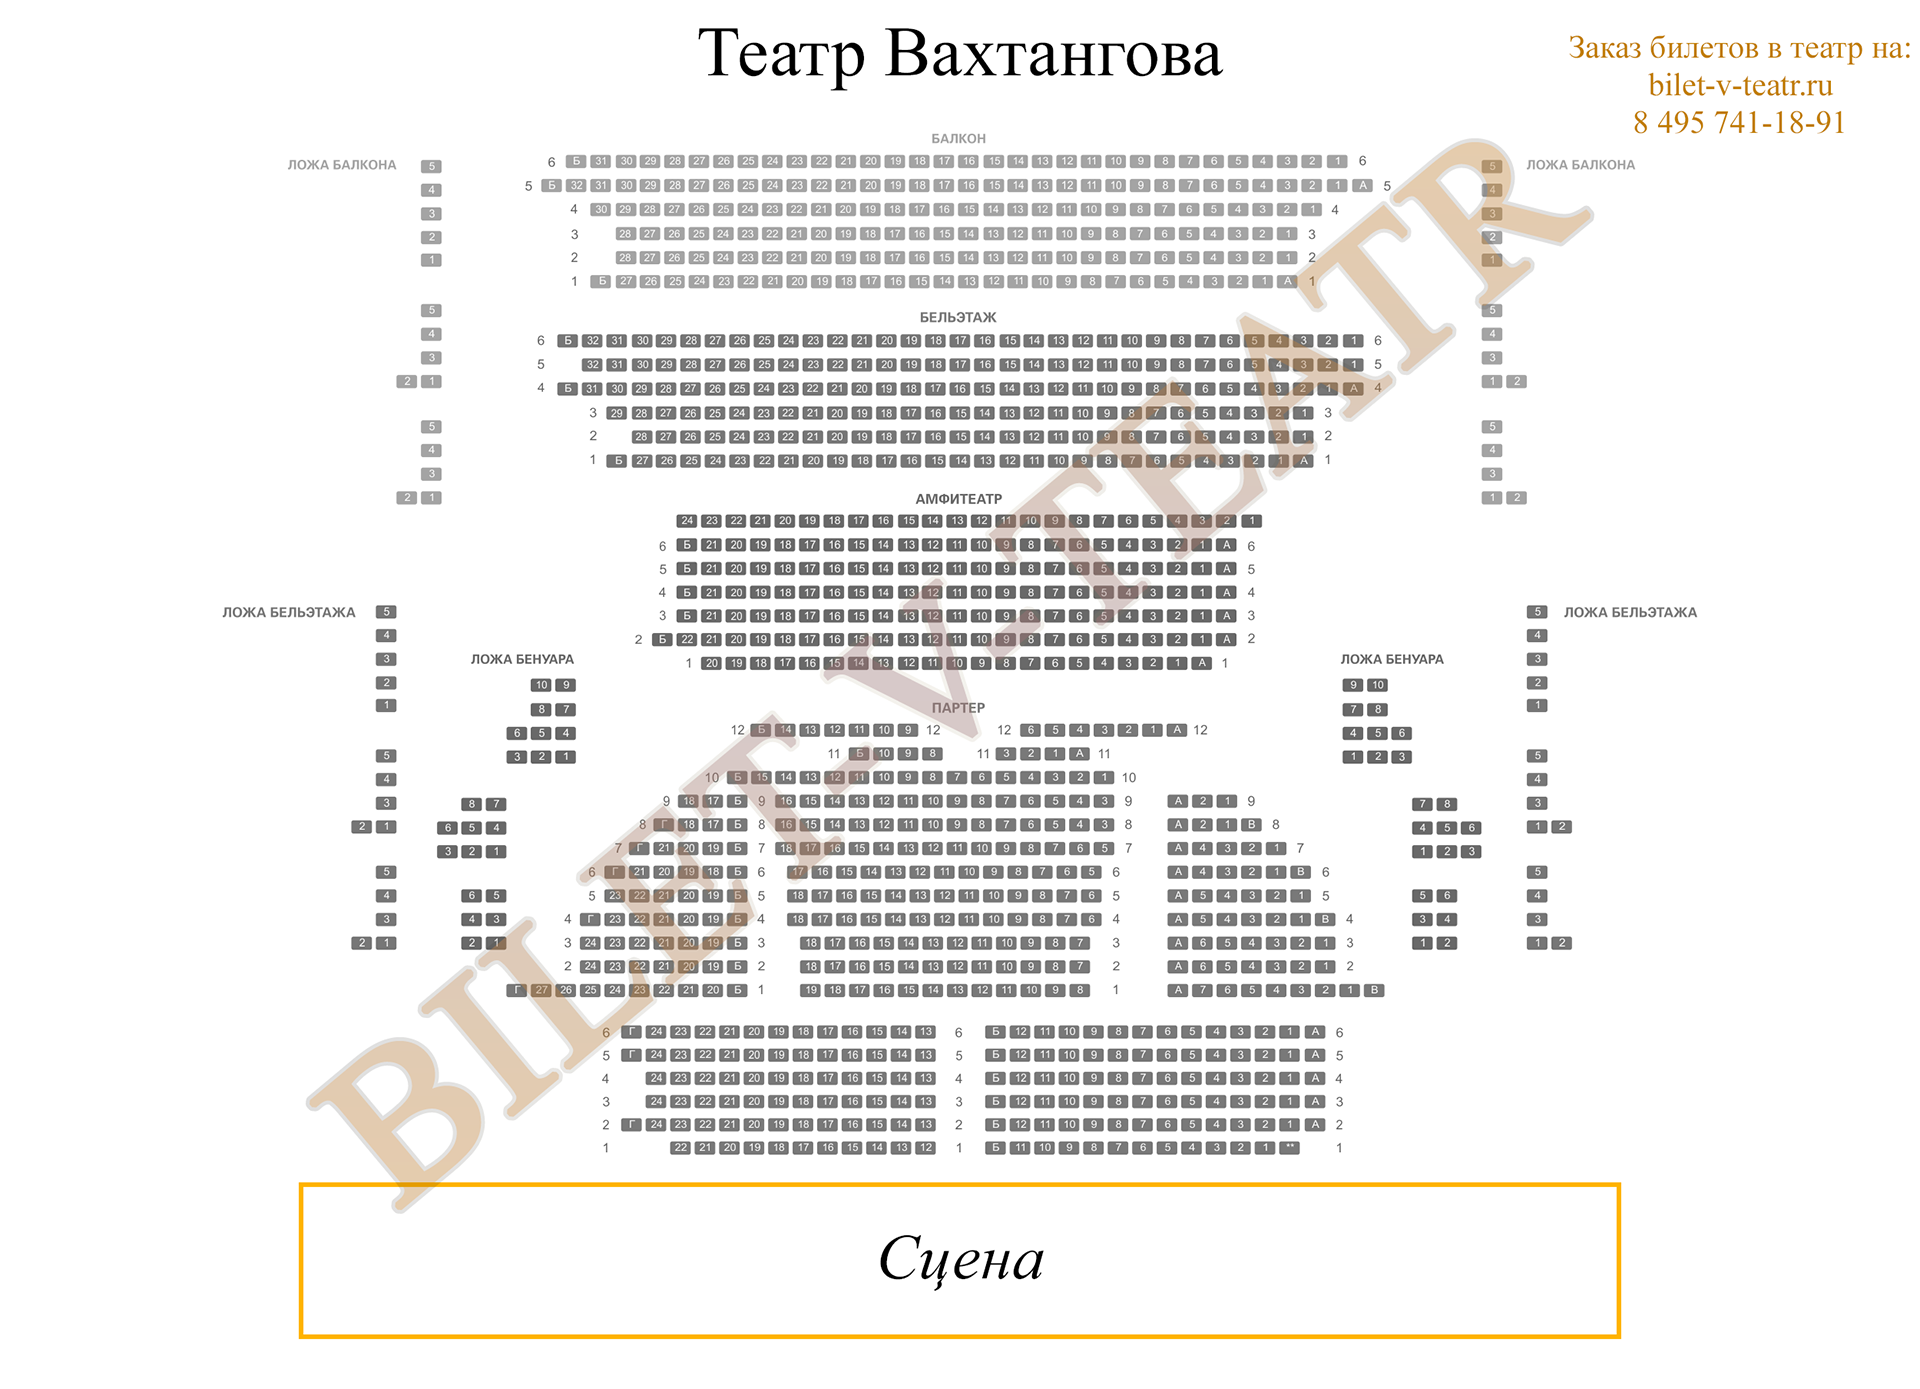 Театр вахтангова новая сцена схема